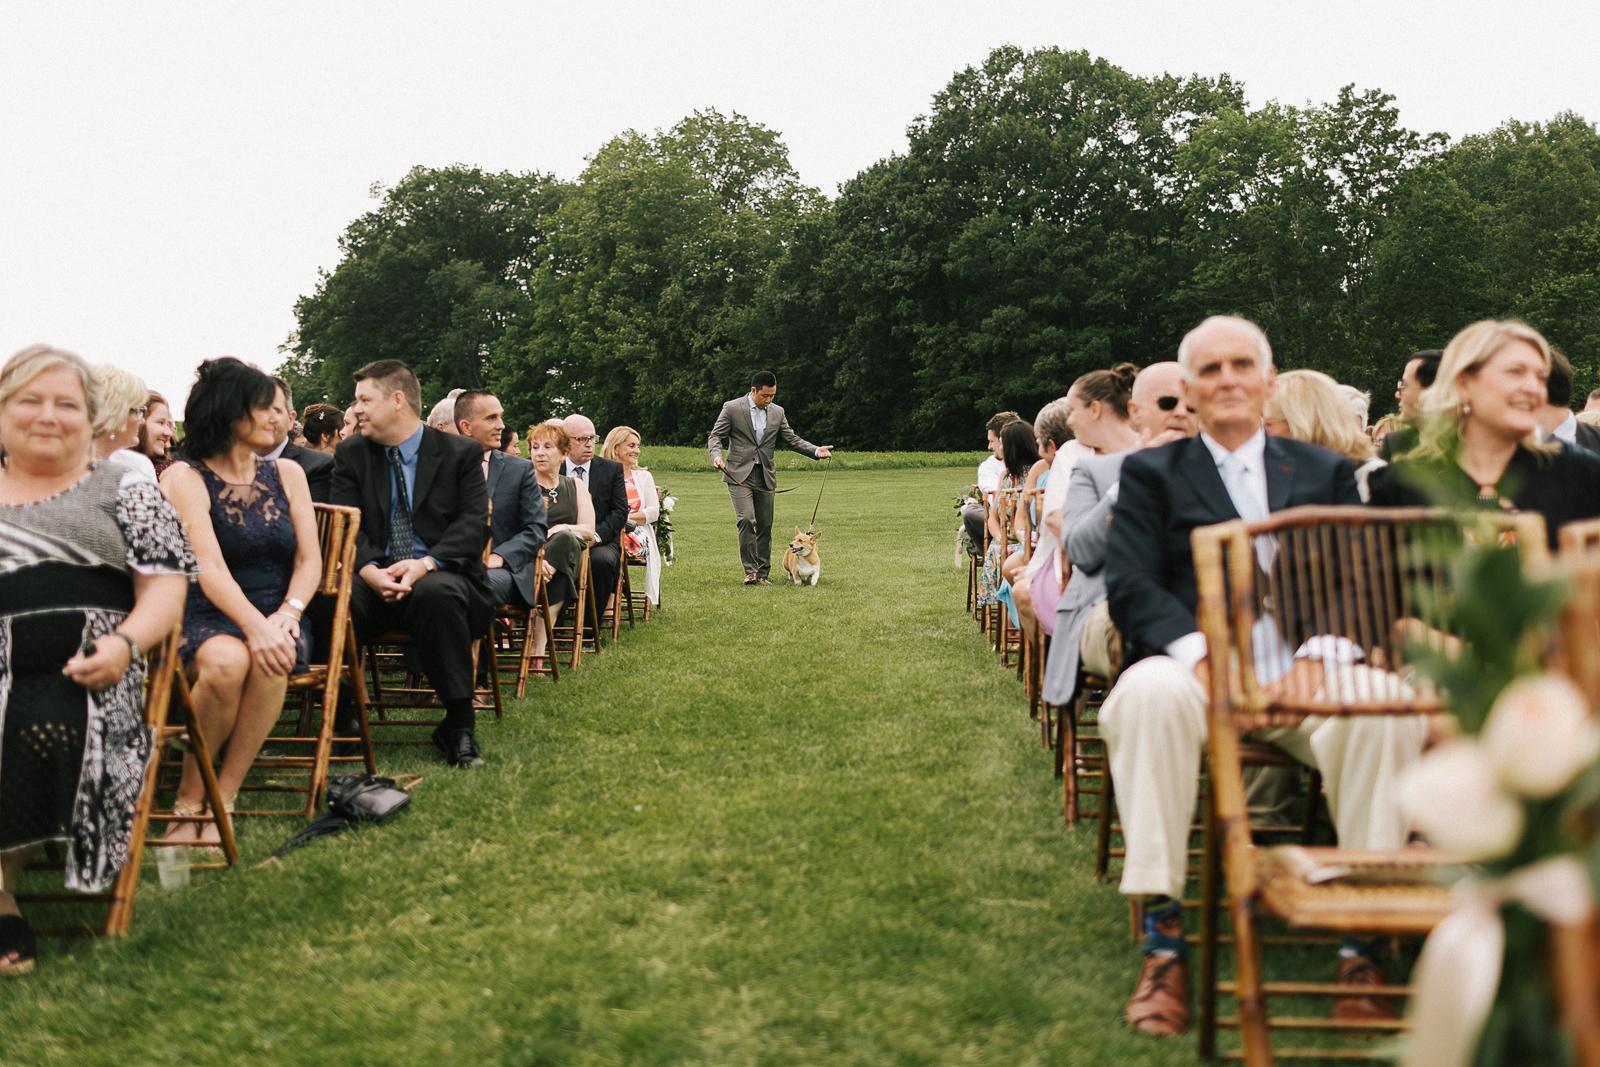 mike-and-jenni-wedding-217.jpg